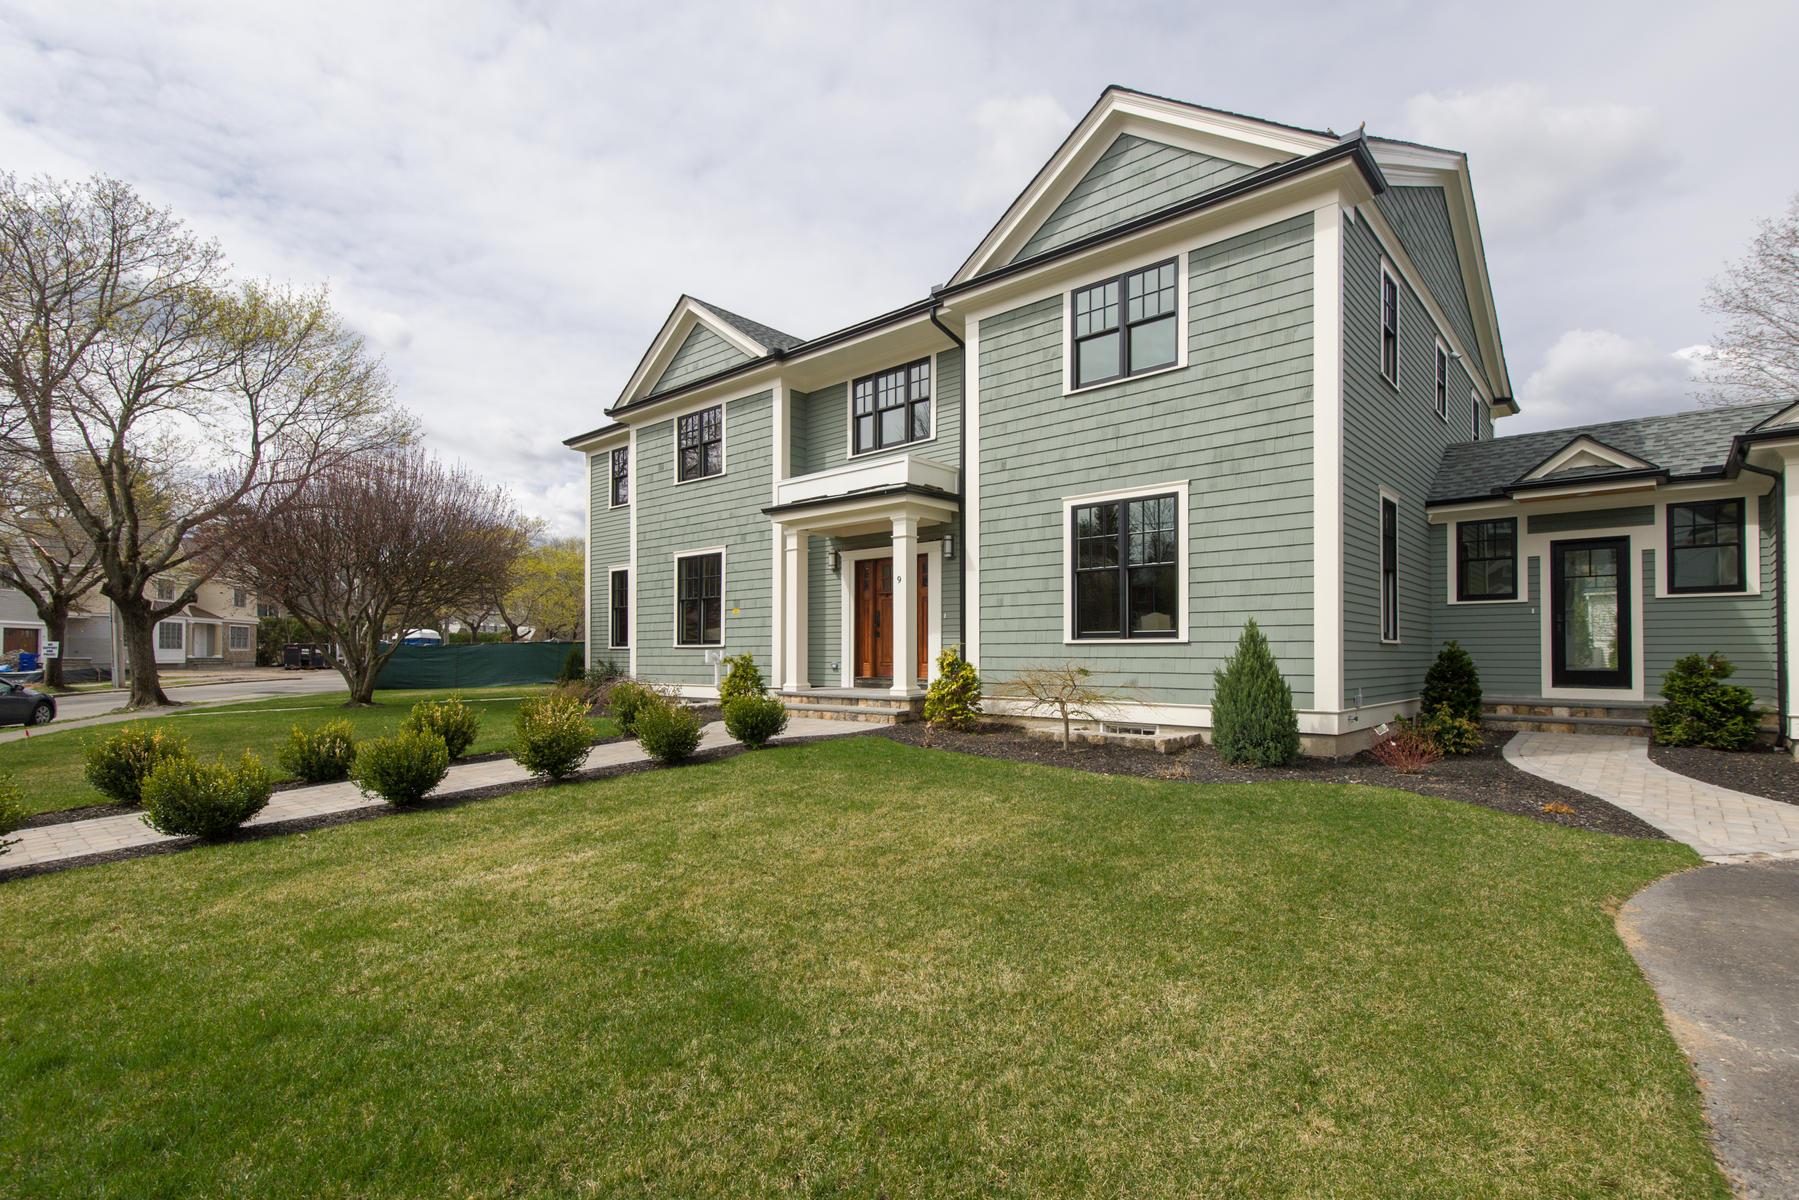 Moradia para Venda às Intriguing Custom Colonial 9 Karen Road Newton, Massachusetts 02468 Estados Unidos